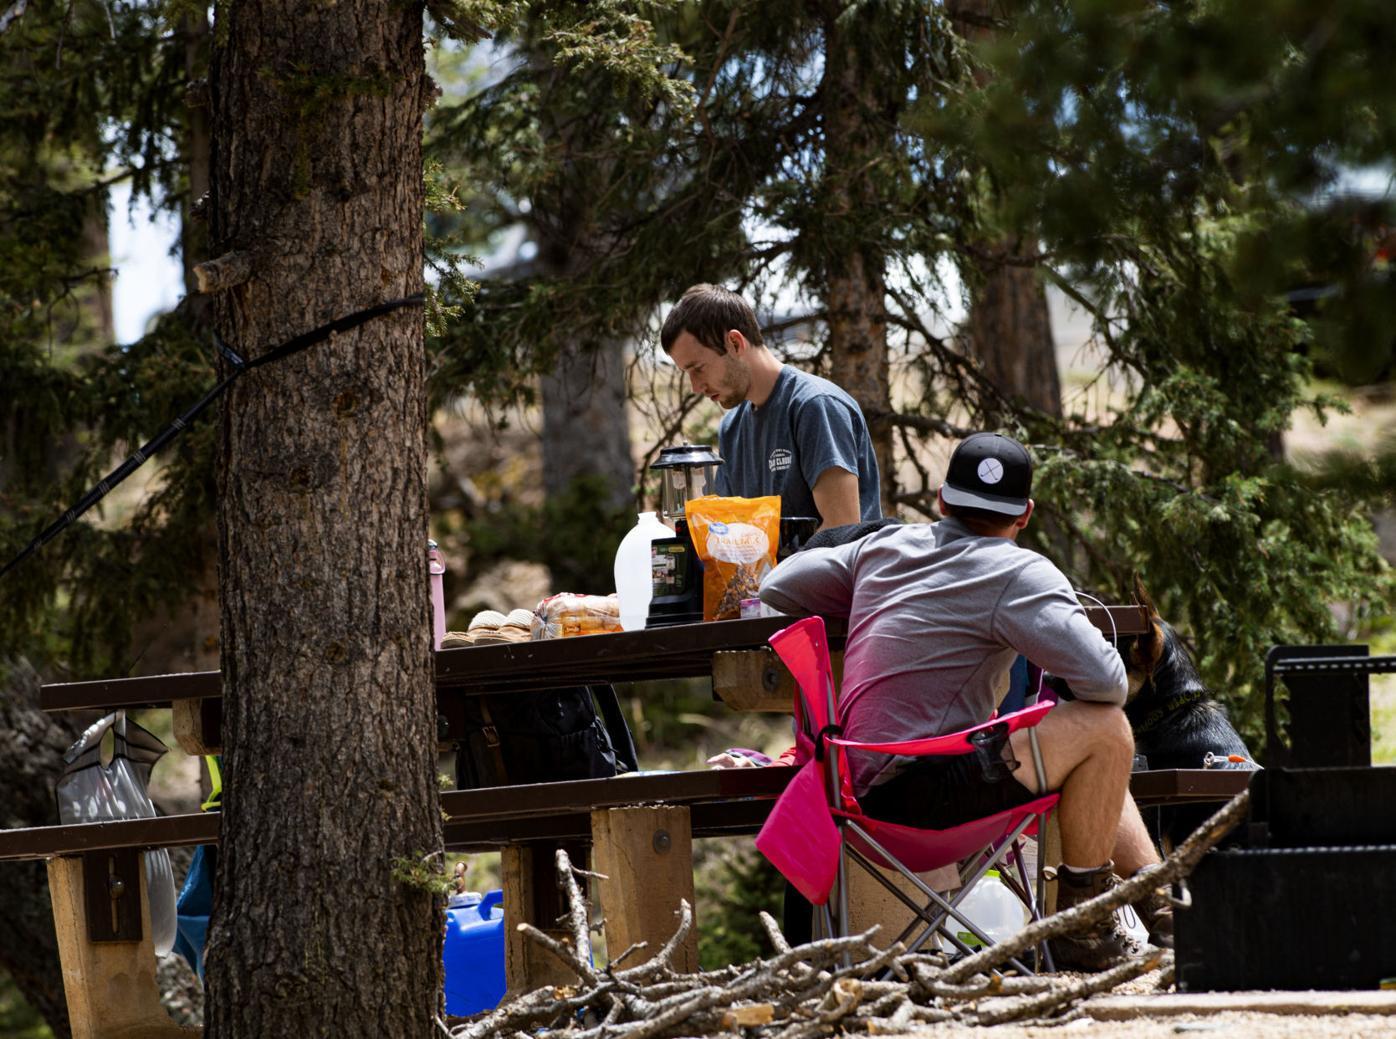 052421-ot-camping 3.jpg